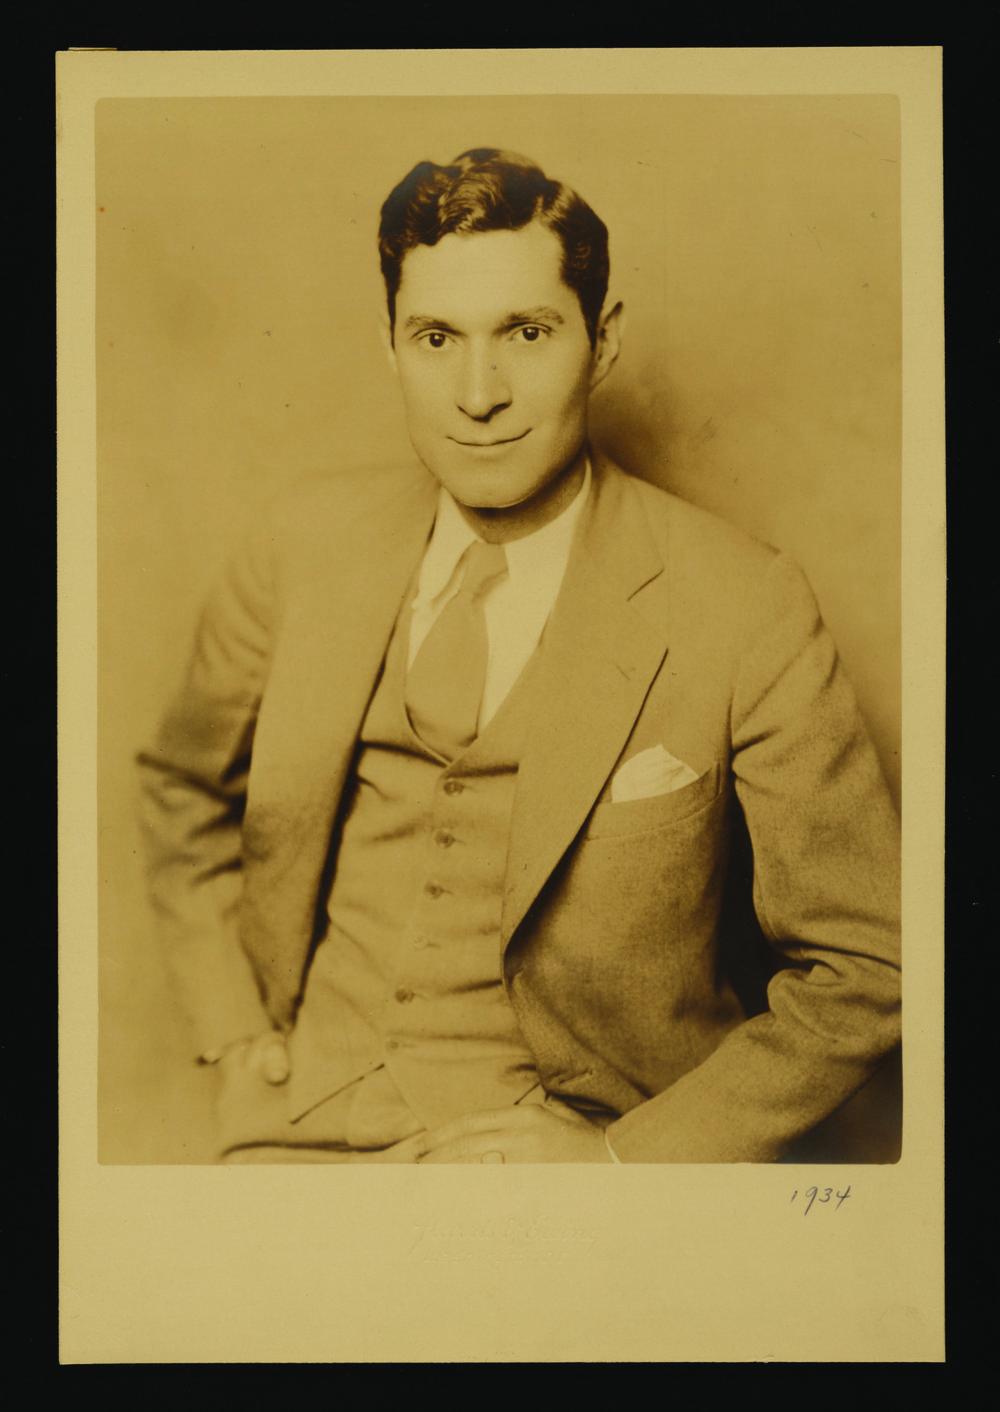 Edward Rowan, 1934.  Photo courtesy of the Smithsonian.